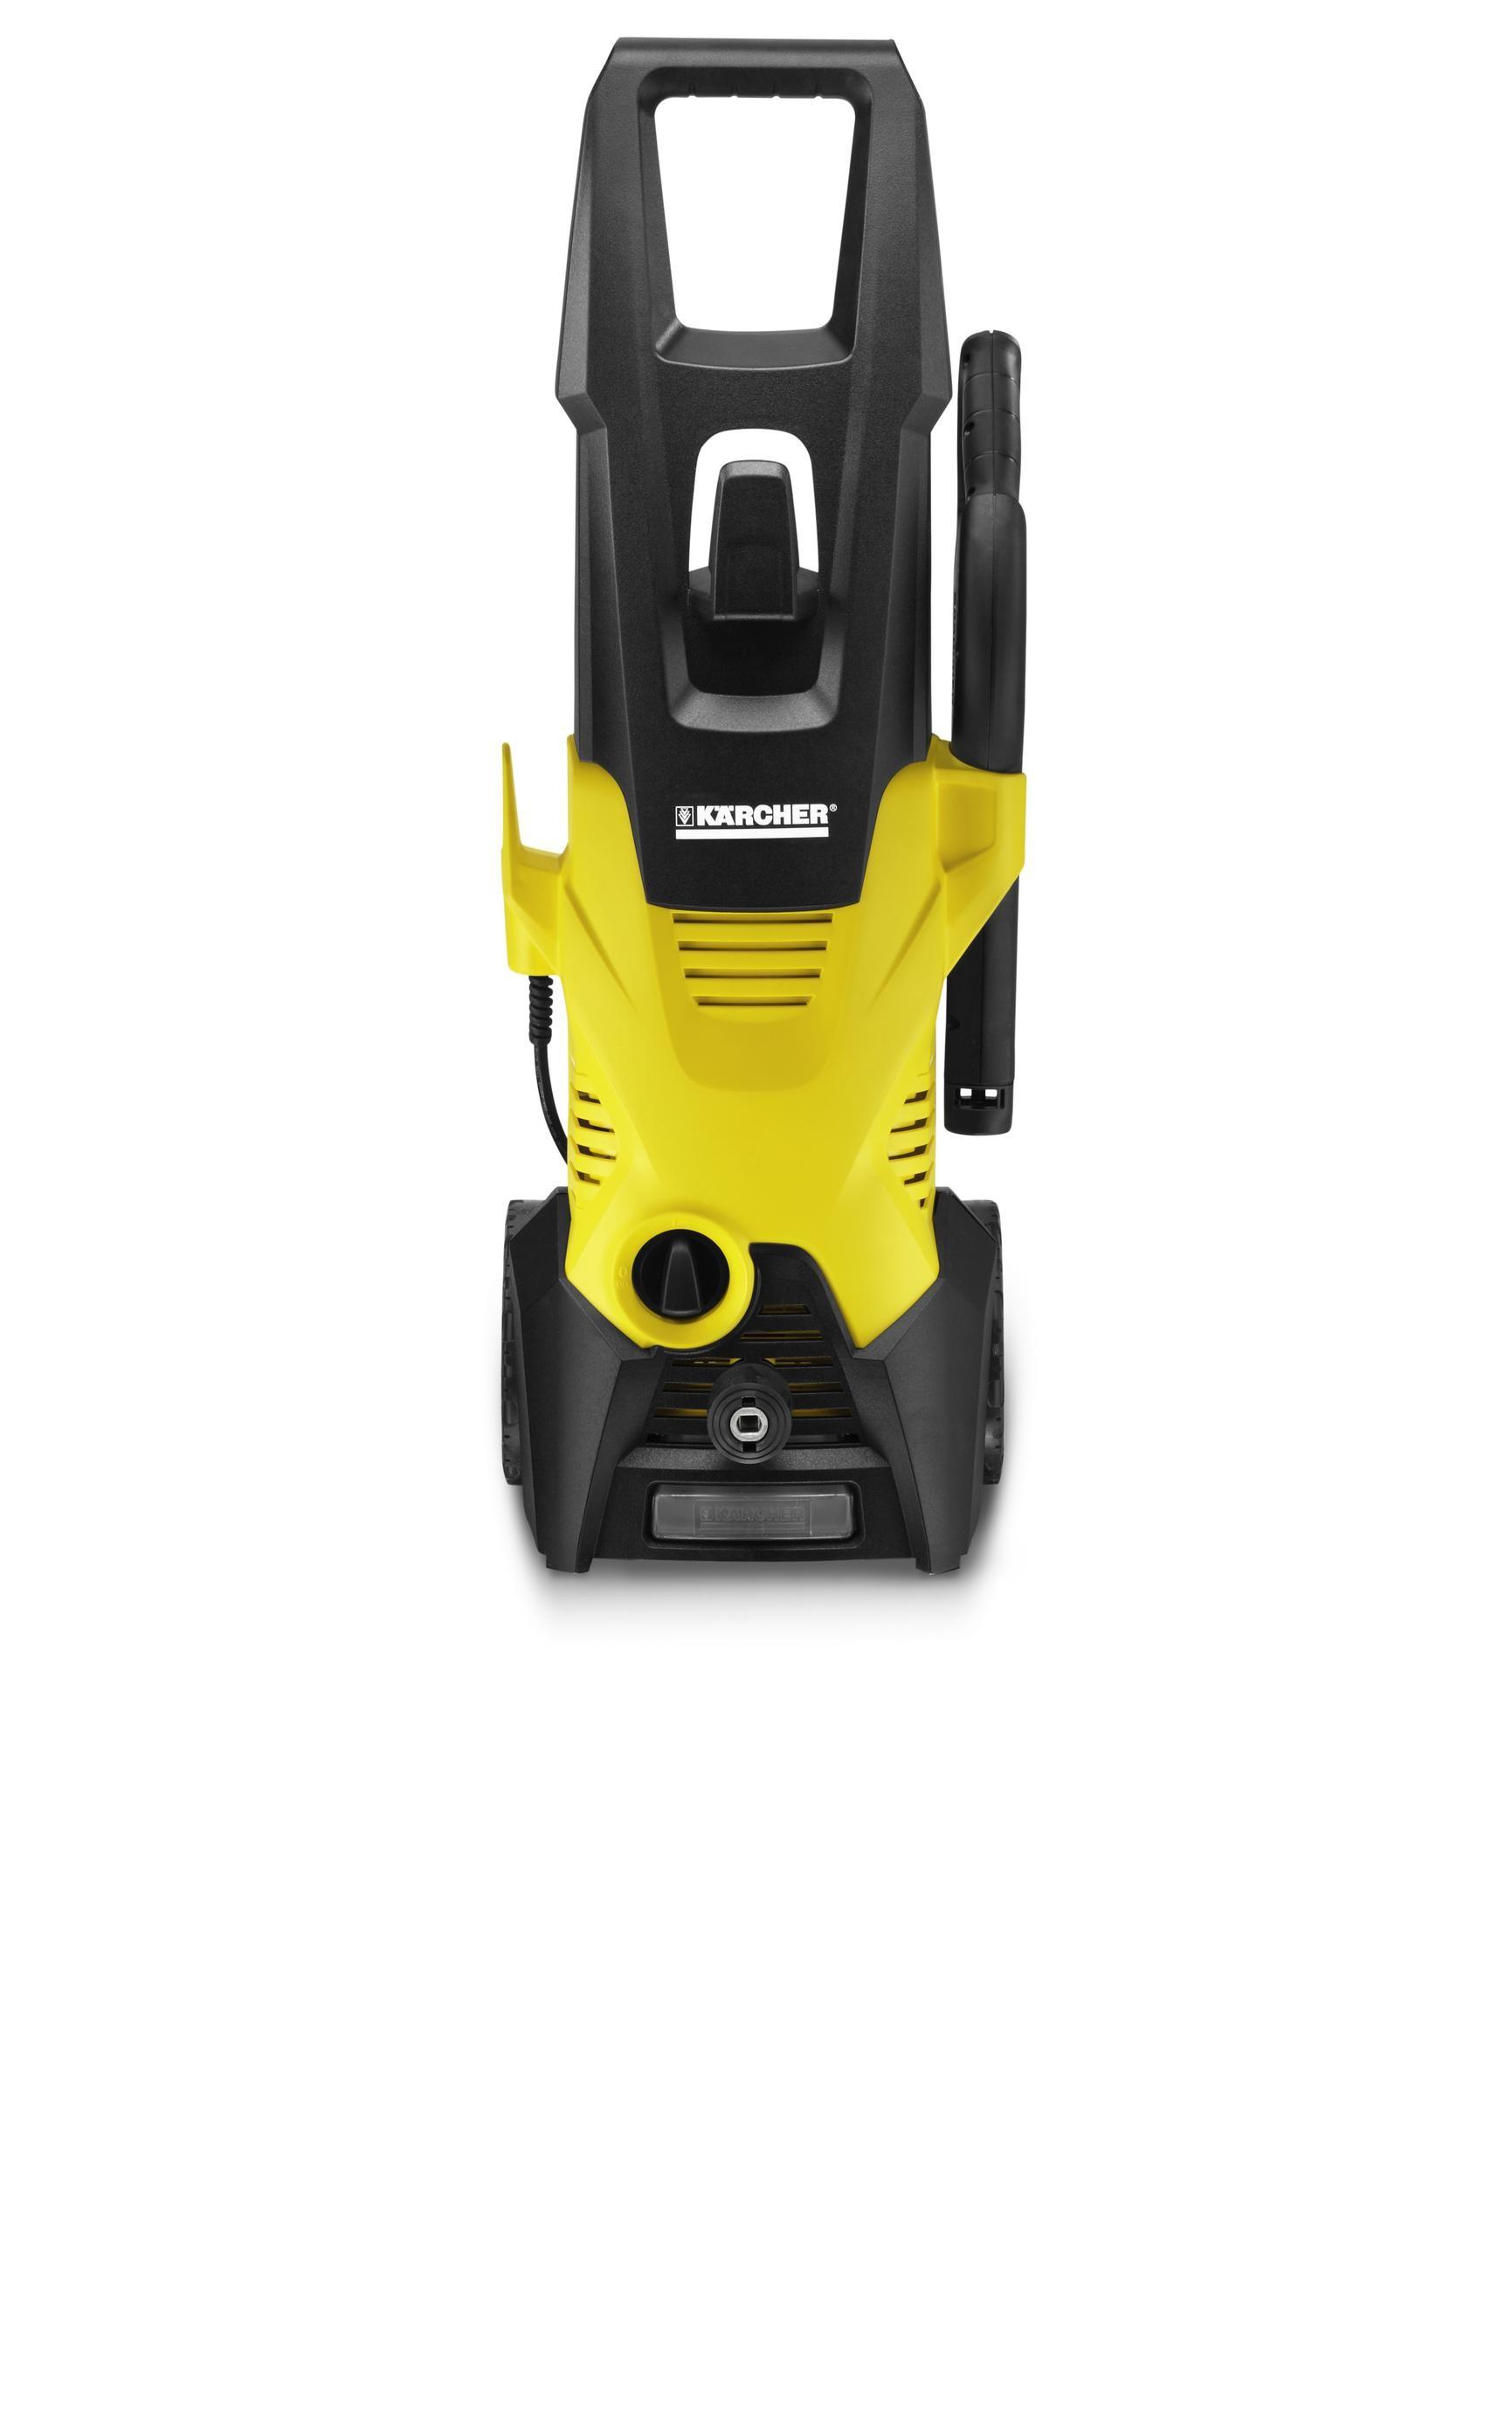 K3 full control idropulitrici karcher pieruccioni e da - Karcher k3 full control ...